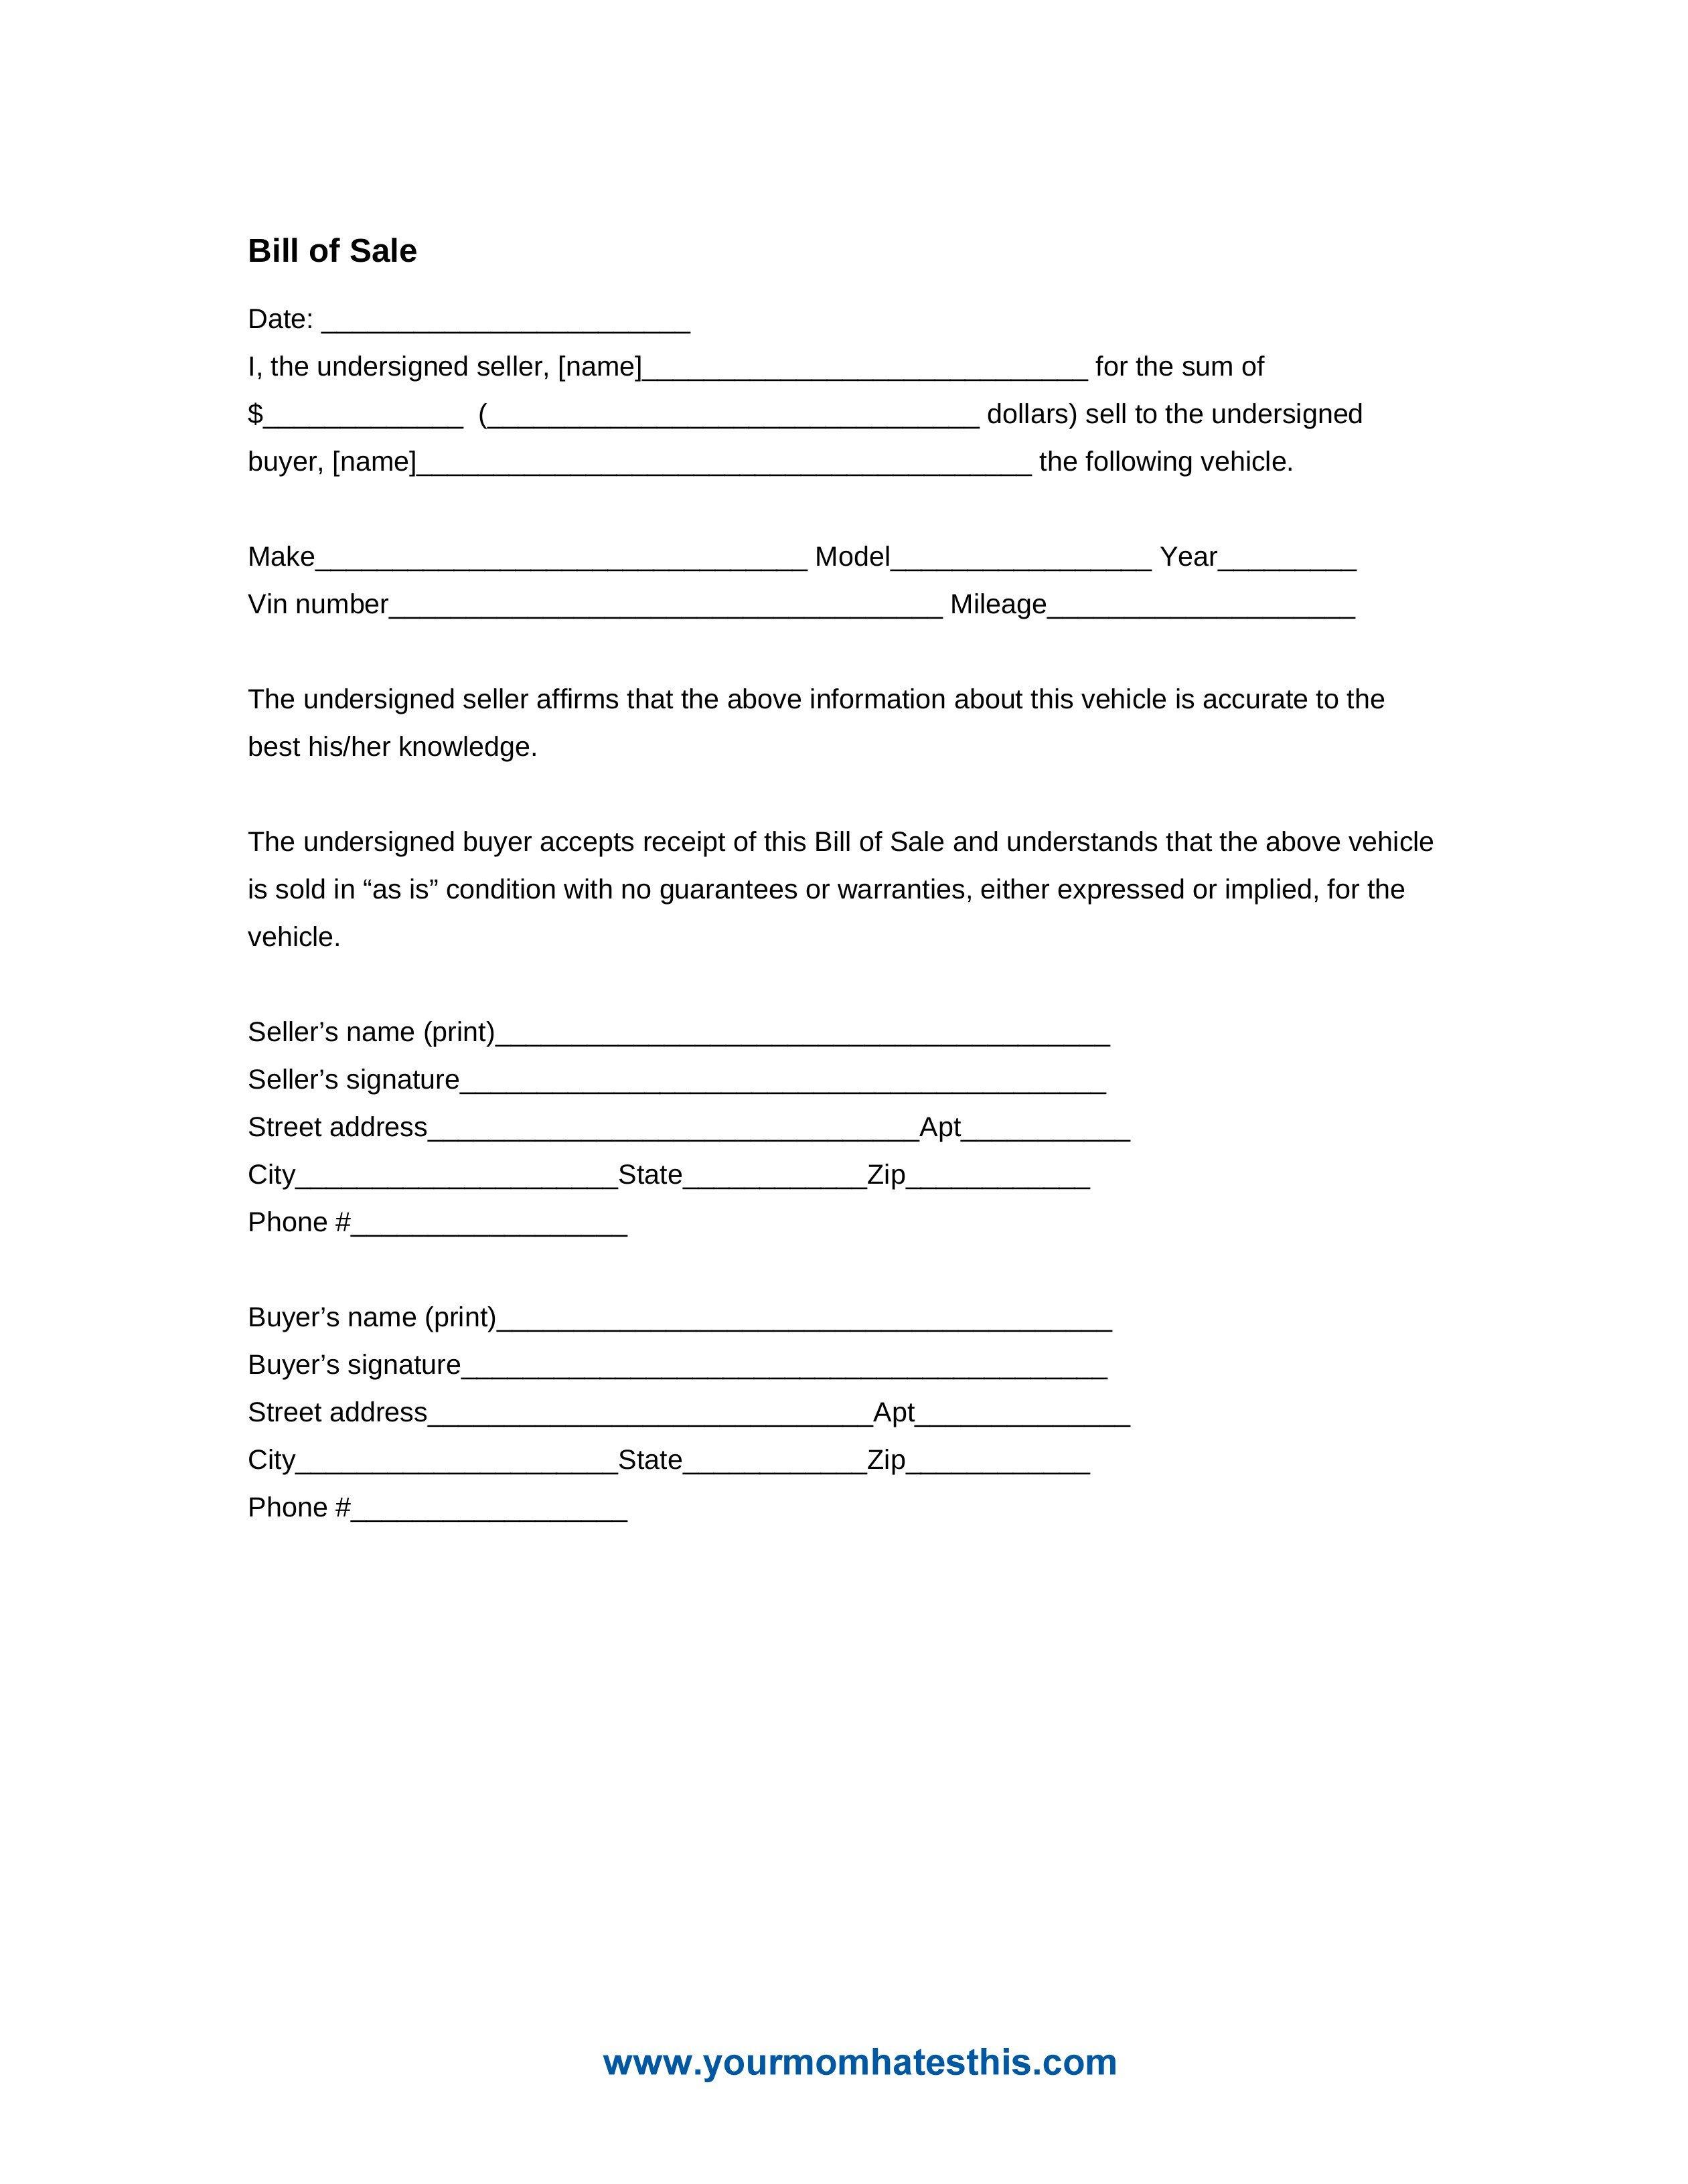 Bill Of Sale Images Download Bill Sale form Pdf